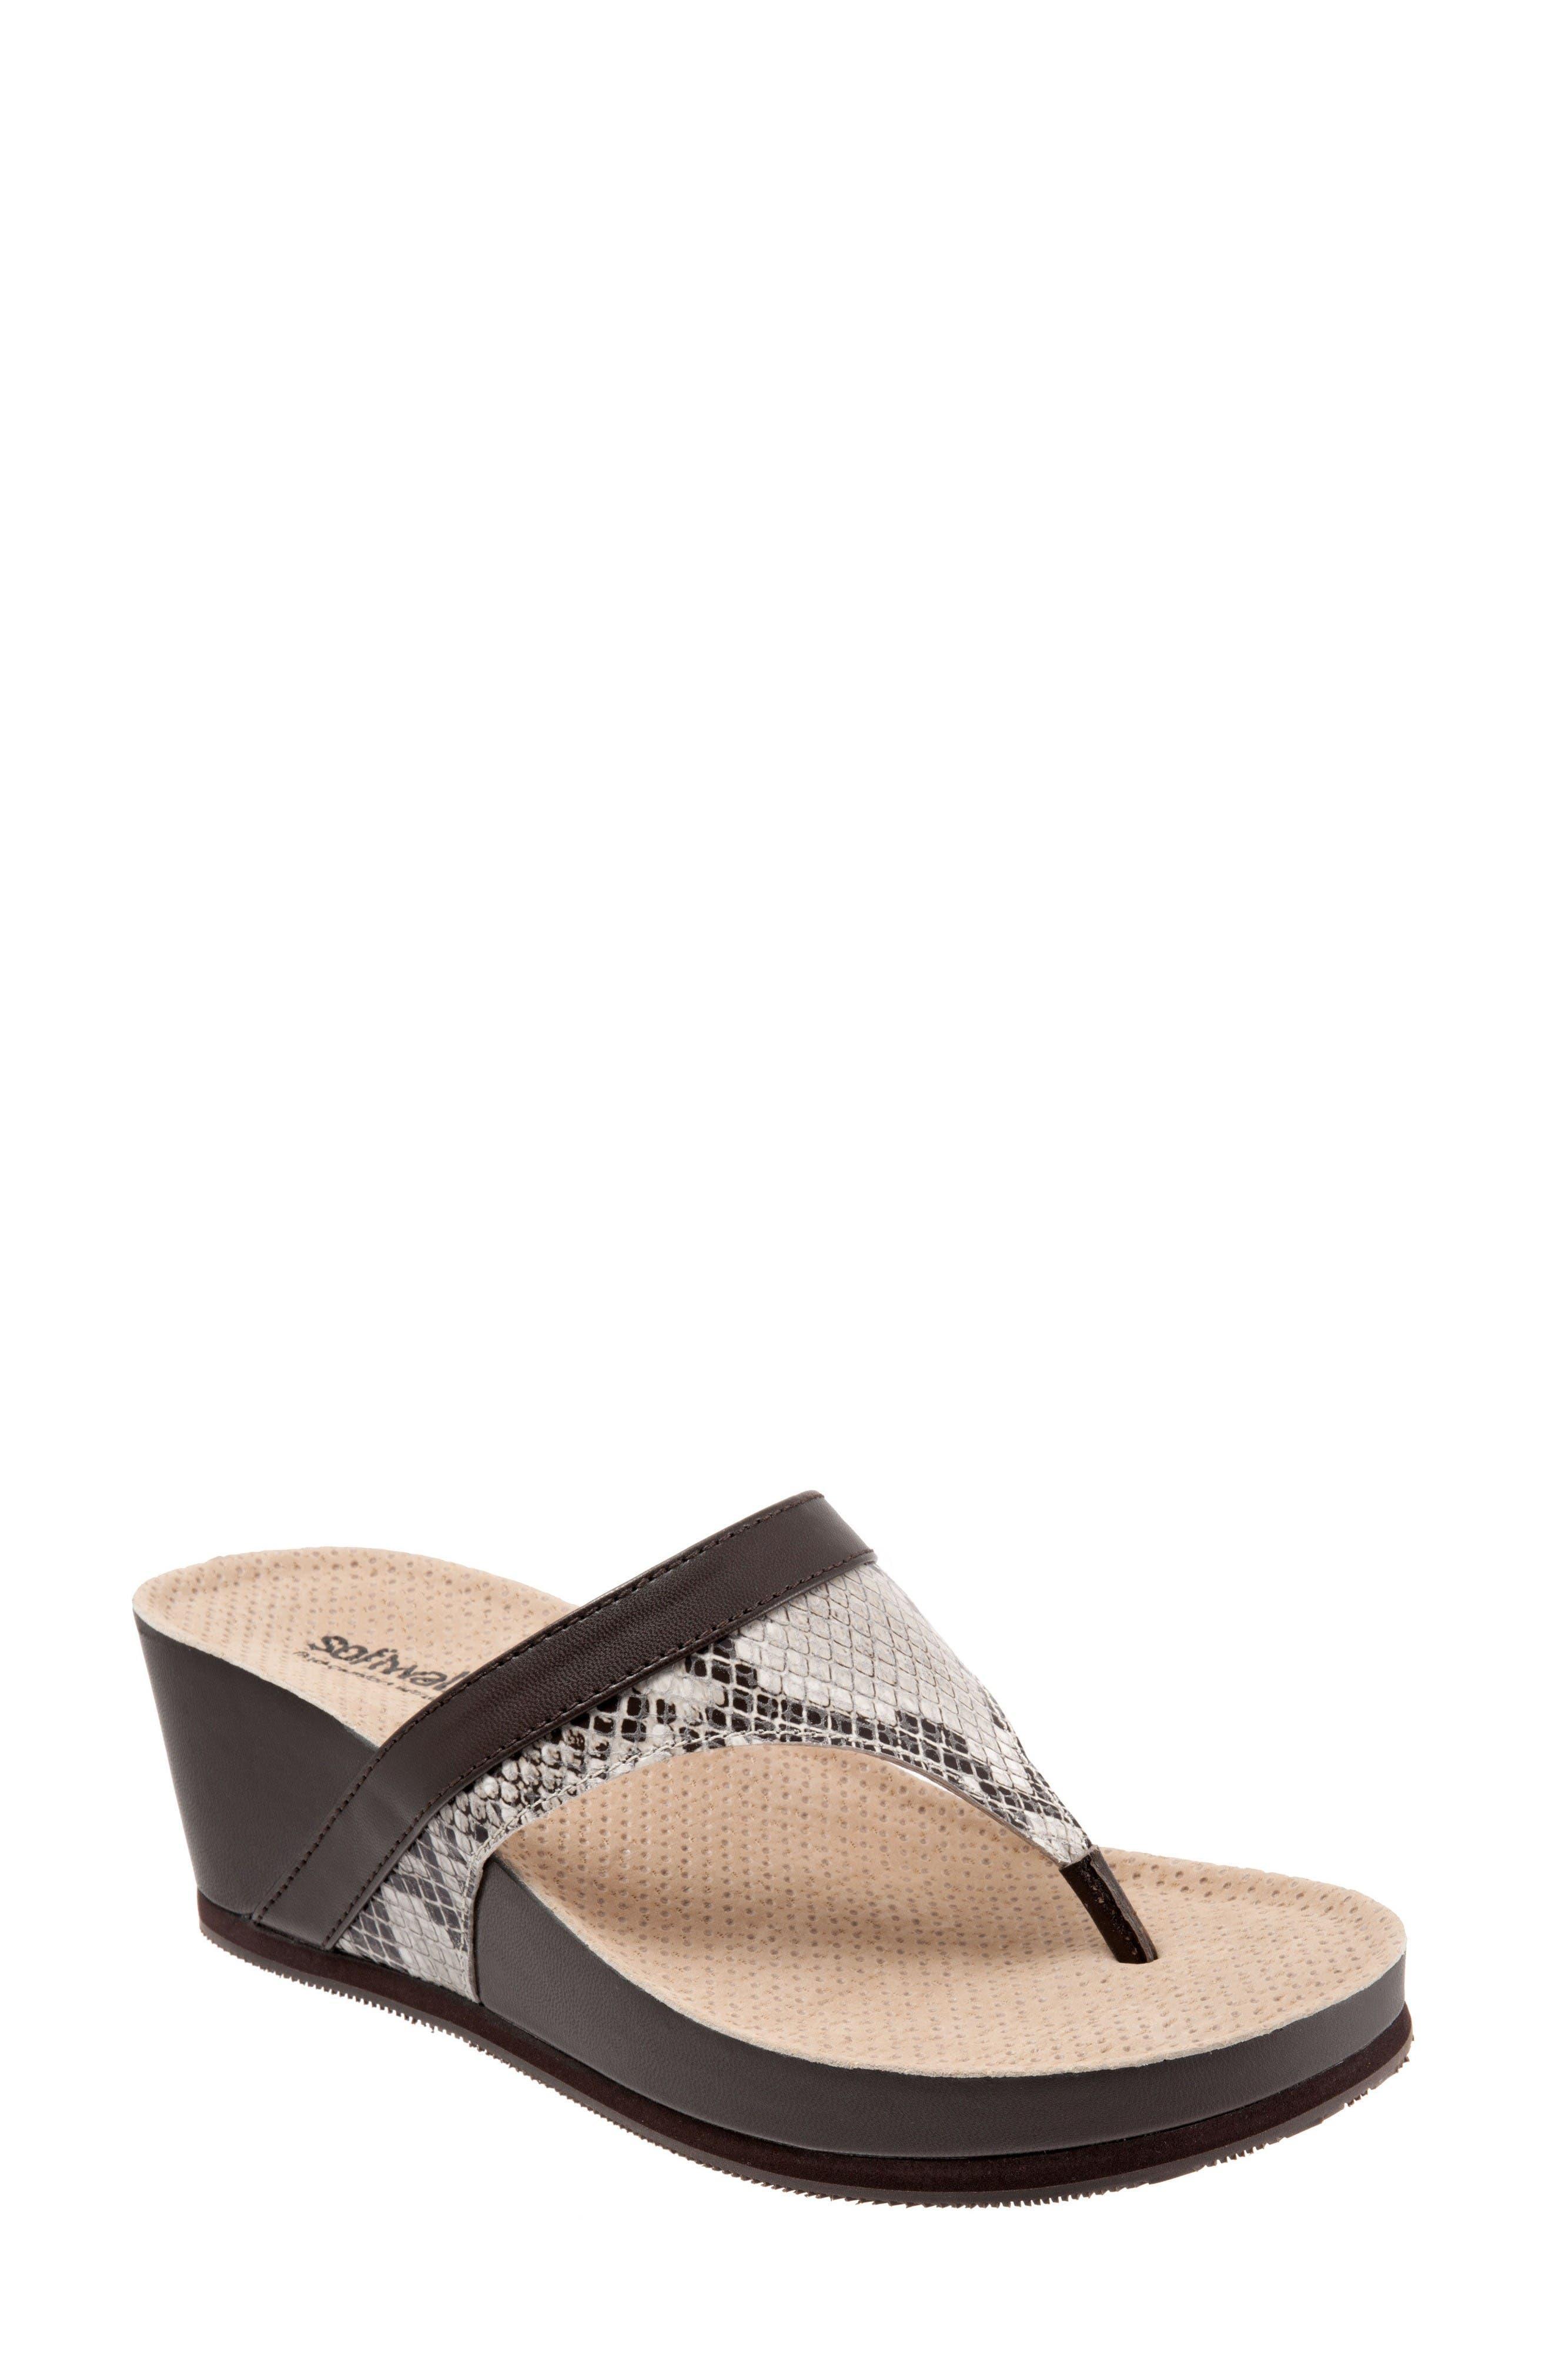 SoftWalk® Heights Wedge Slide Sandal (Women)